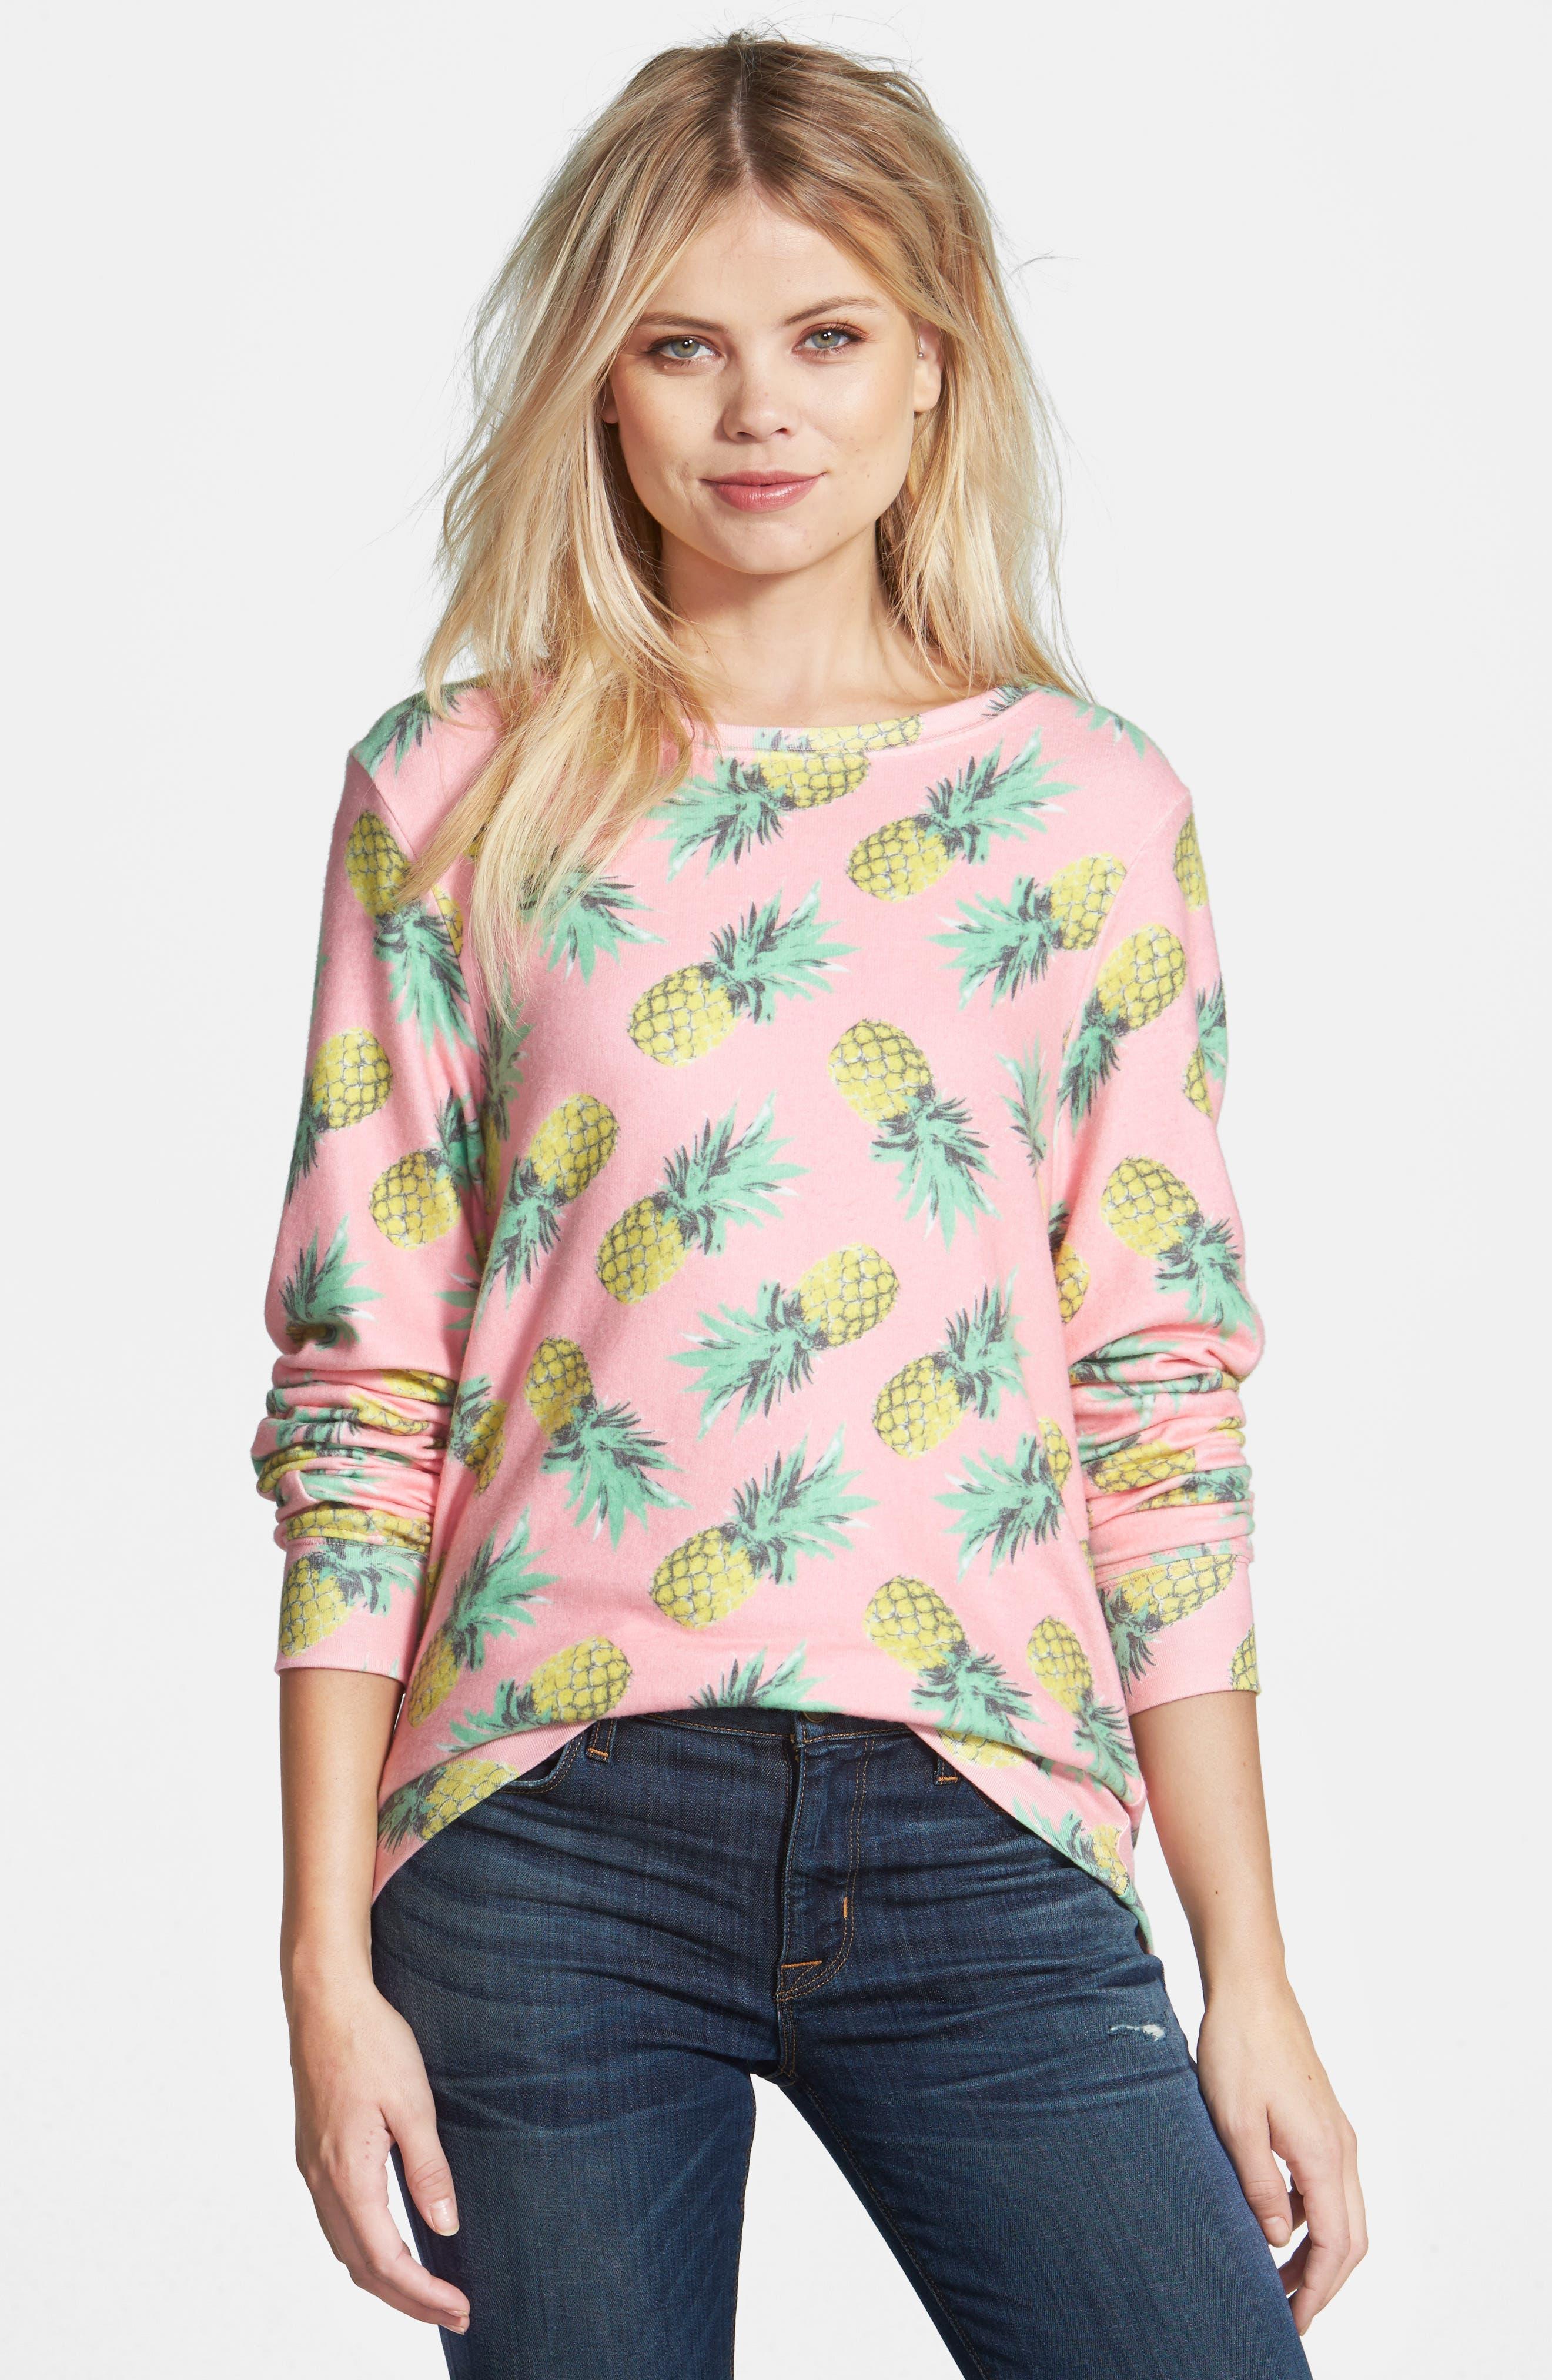 'Pineapple Palace' Sweatshirt,                             Alternate thumbnail 4, color,                             690